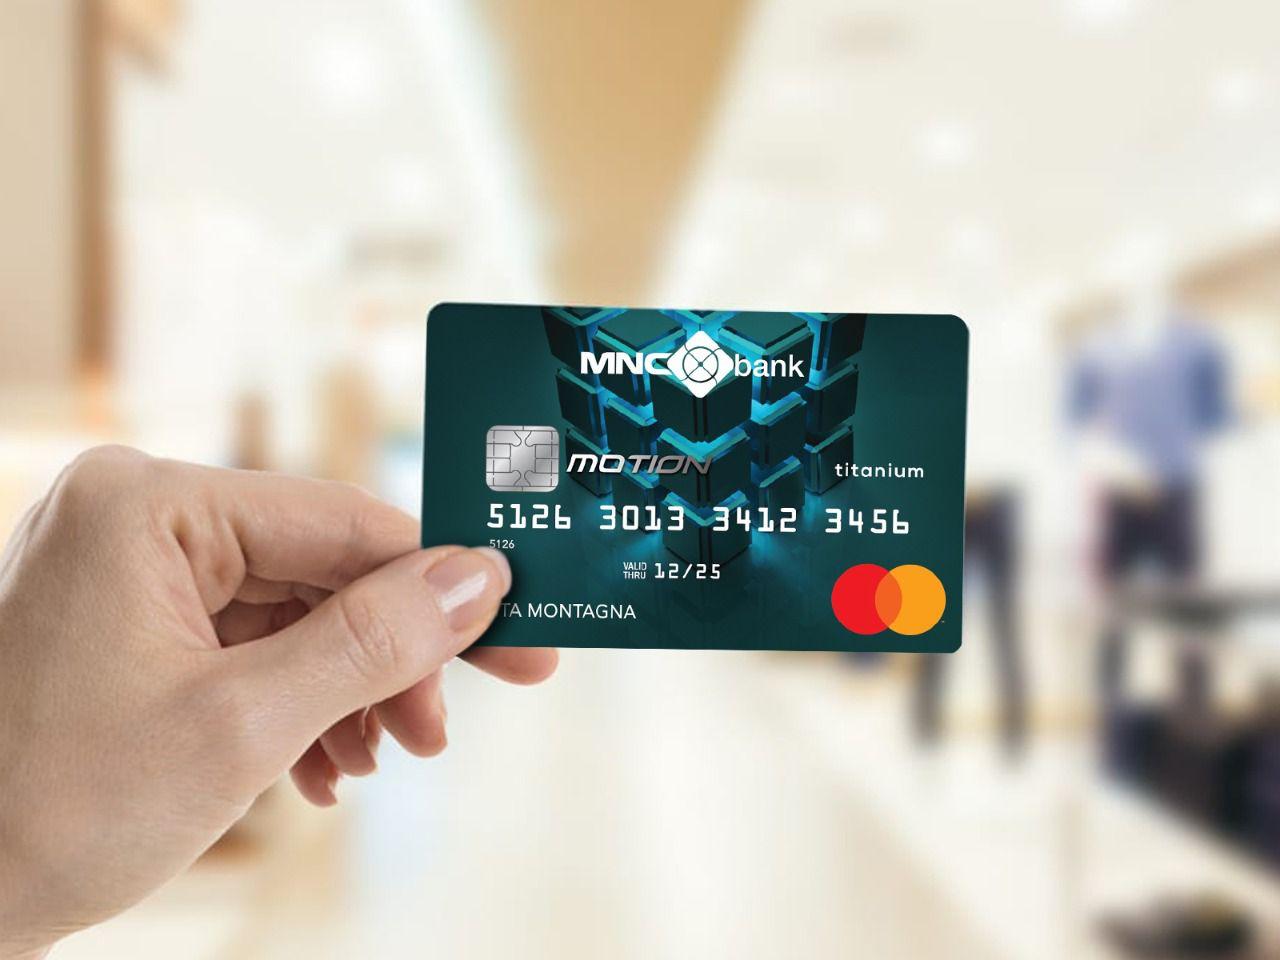 https: img.okezone.com content 2021 09 03 278 2465503 dear-shopper-mnc-bank-babp-tebar-diskon-sambut-9-9-sale-cek-di-sini-0C3Ica3d1c.jpg